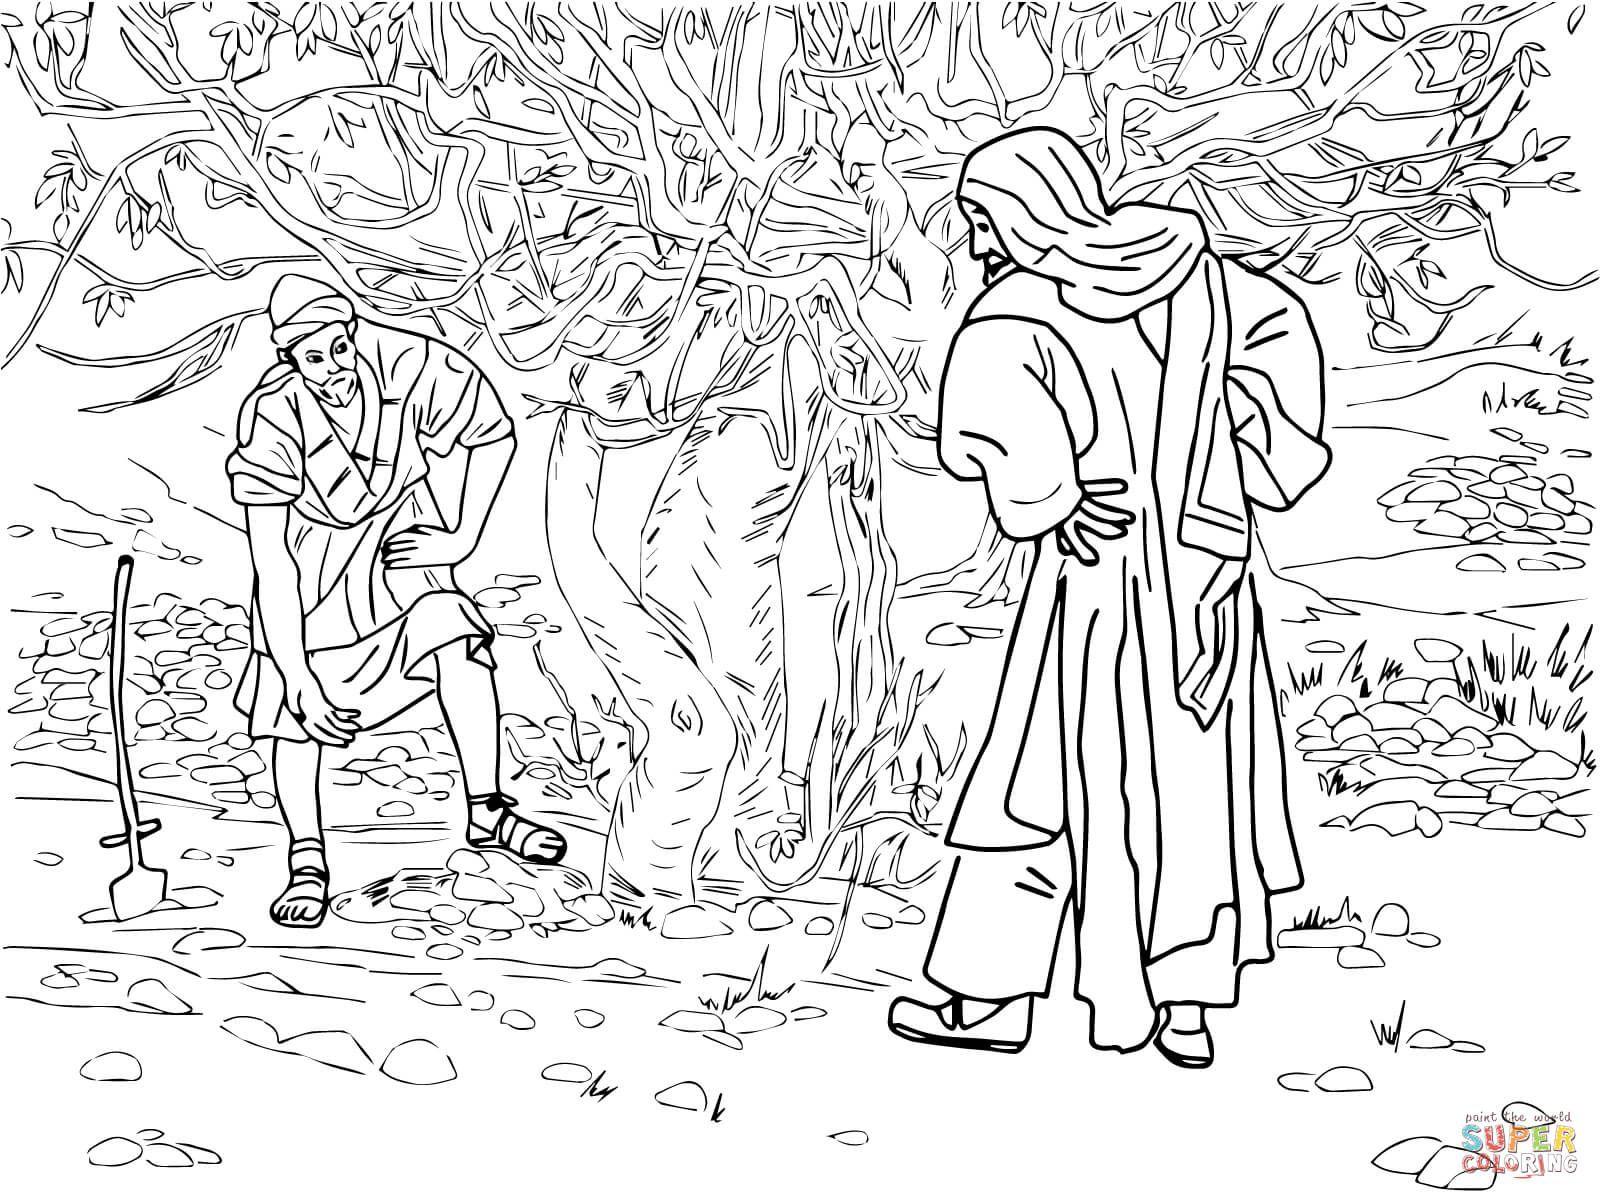 Barren Fig Tree Parable | Super Coloring | Bible Class ...